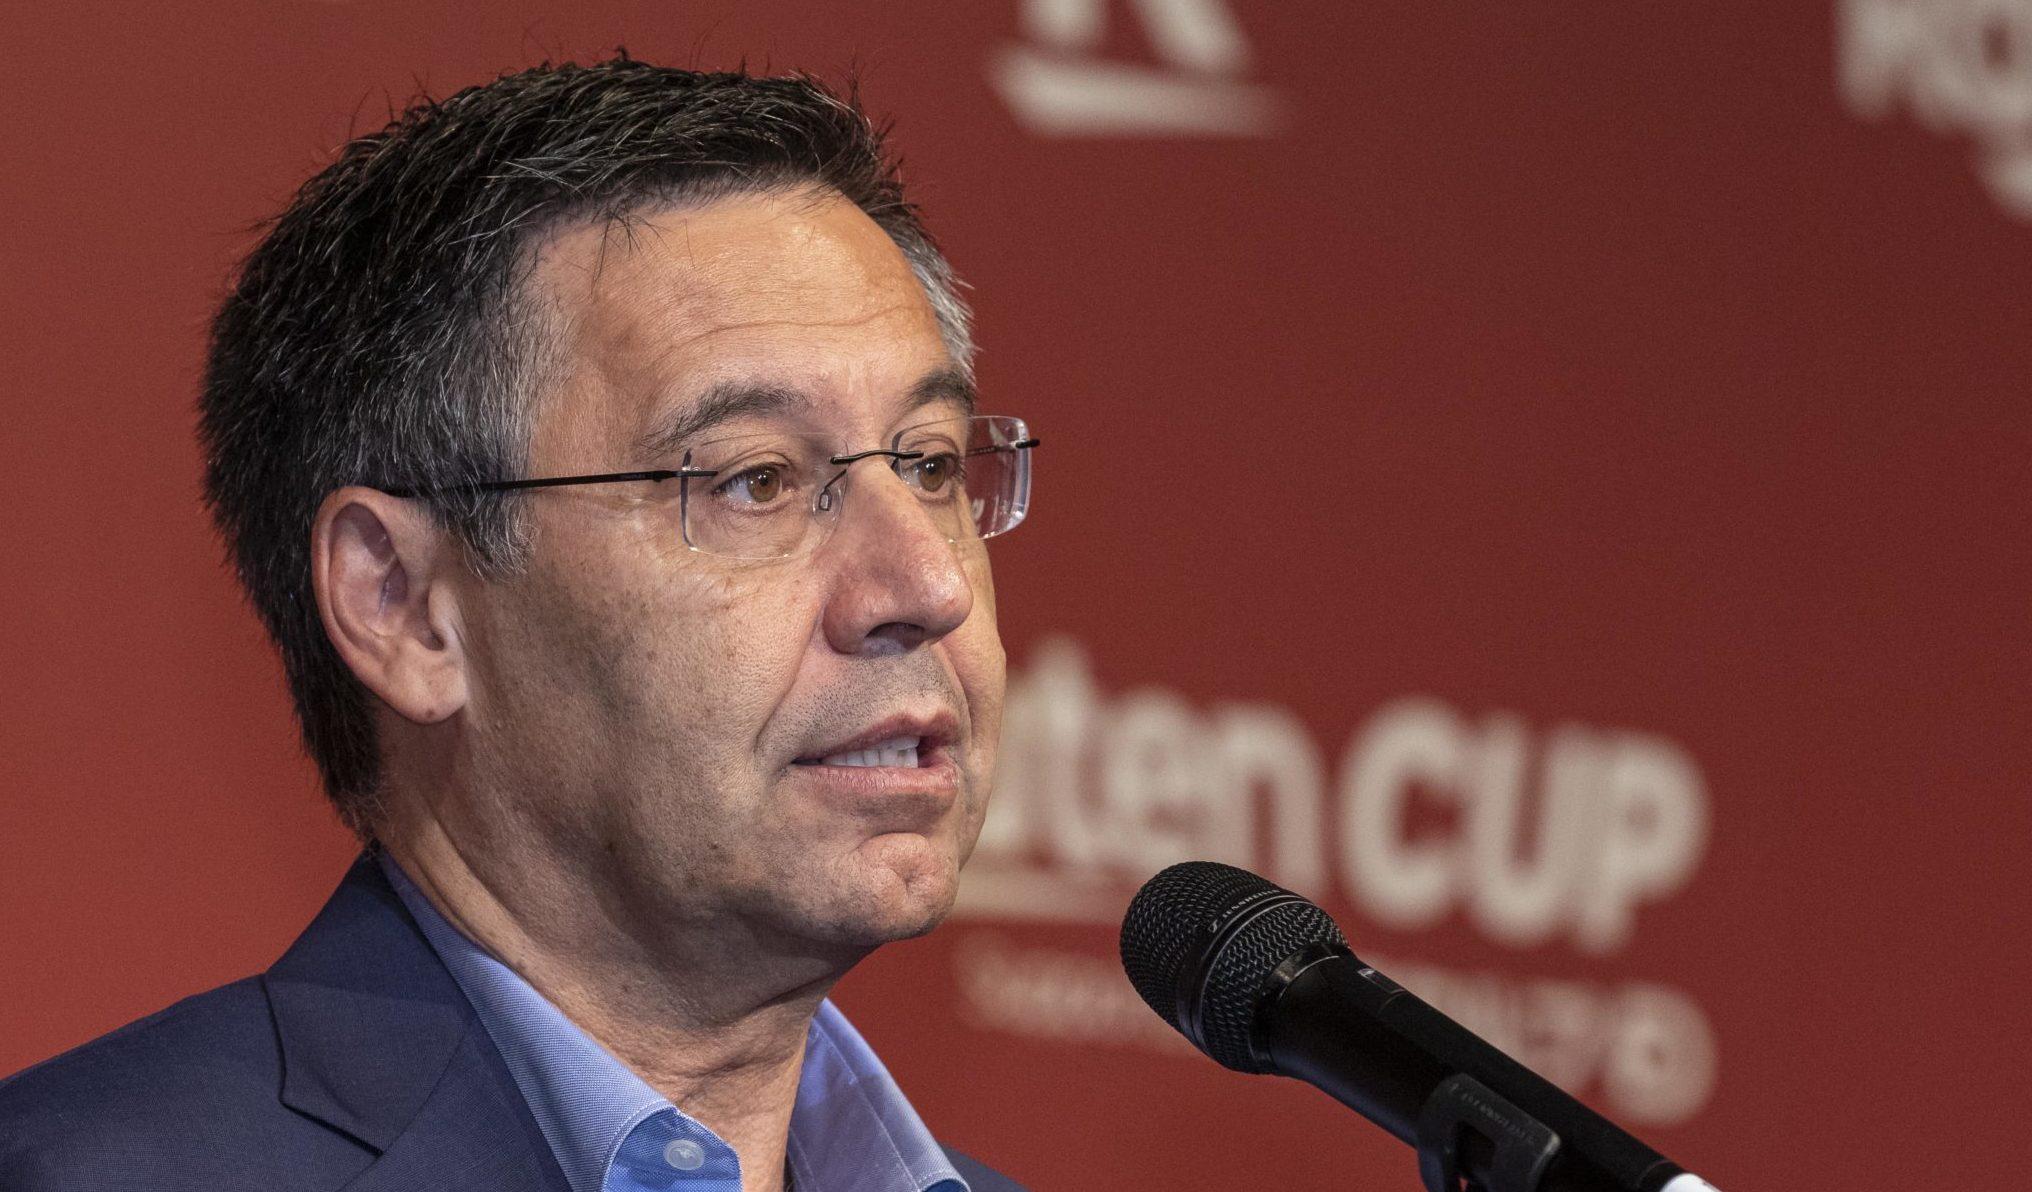 Former Barcelona president, Josep Maria Bartomeu